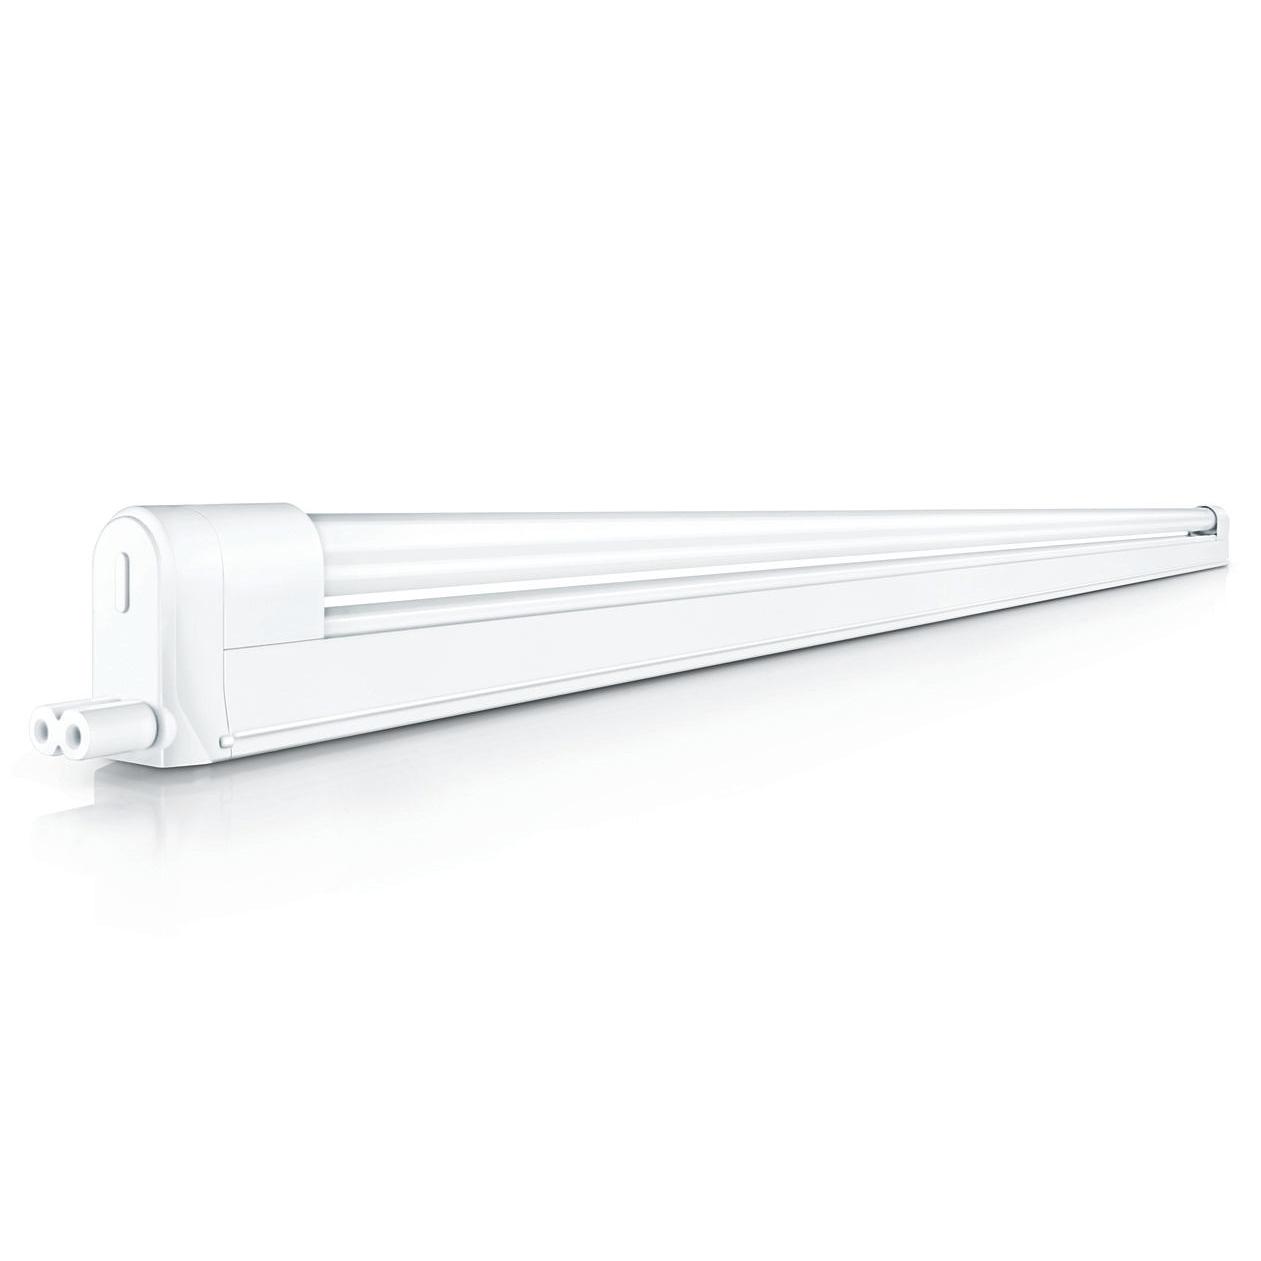 Philips T5 2 Essential Linear Fluorescent Batten Day Light L Brilliant Source Lighting